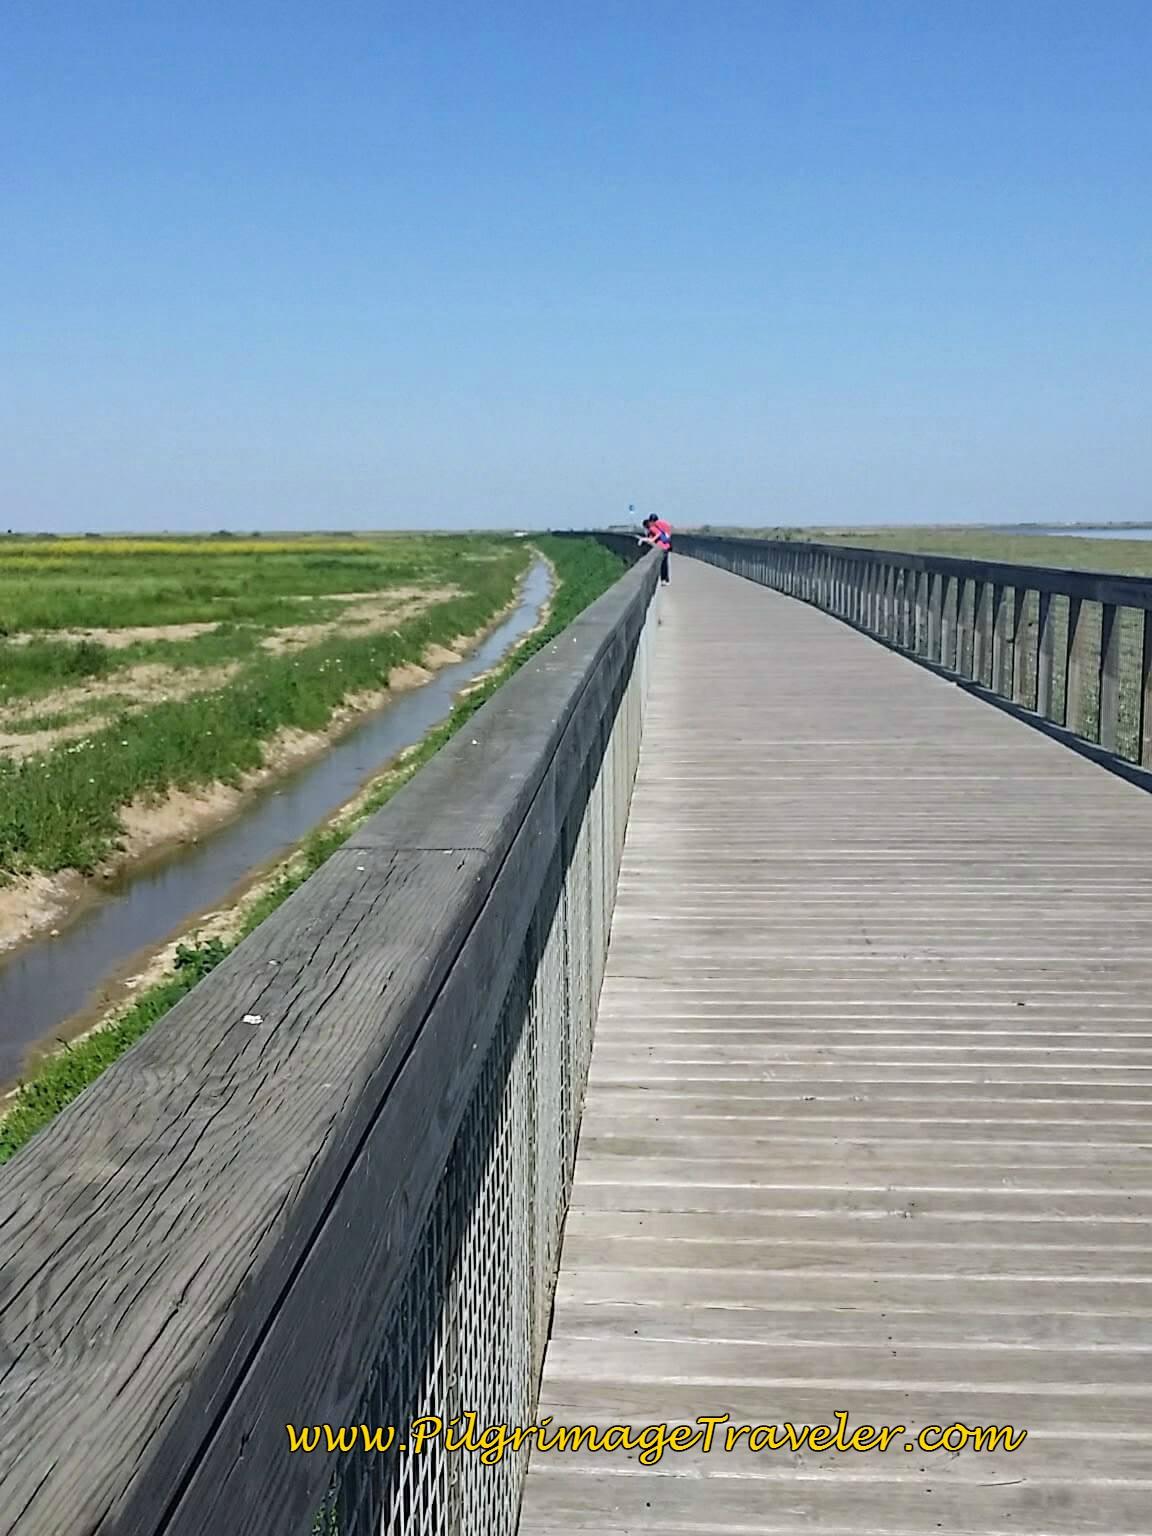 The Long Boardwalk along the Tagus, Alverca, Portugal